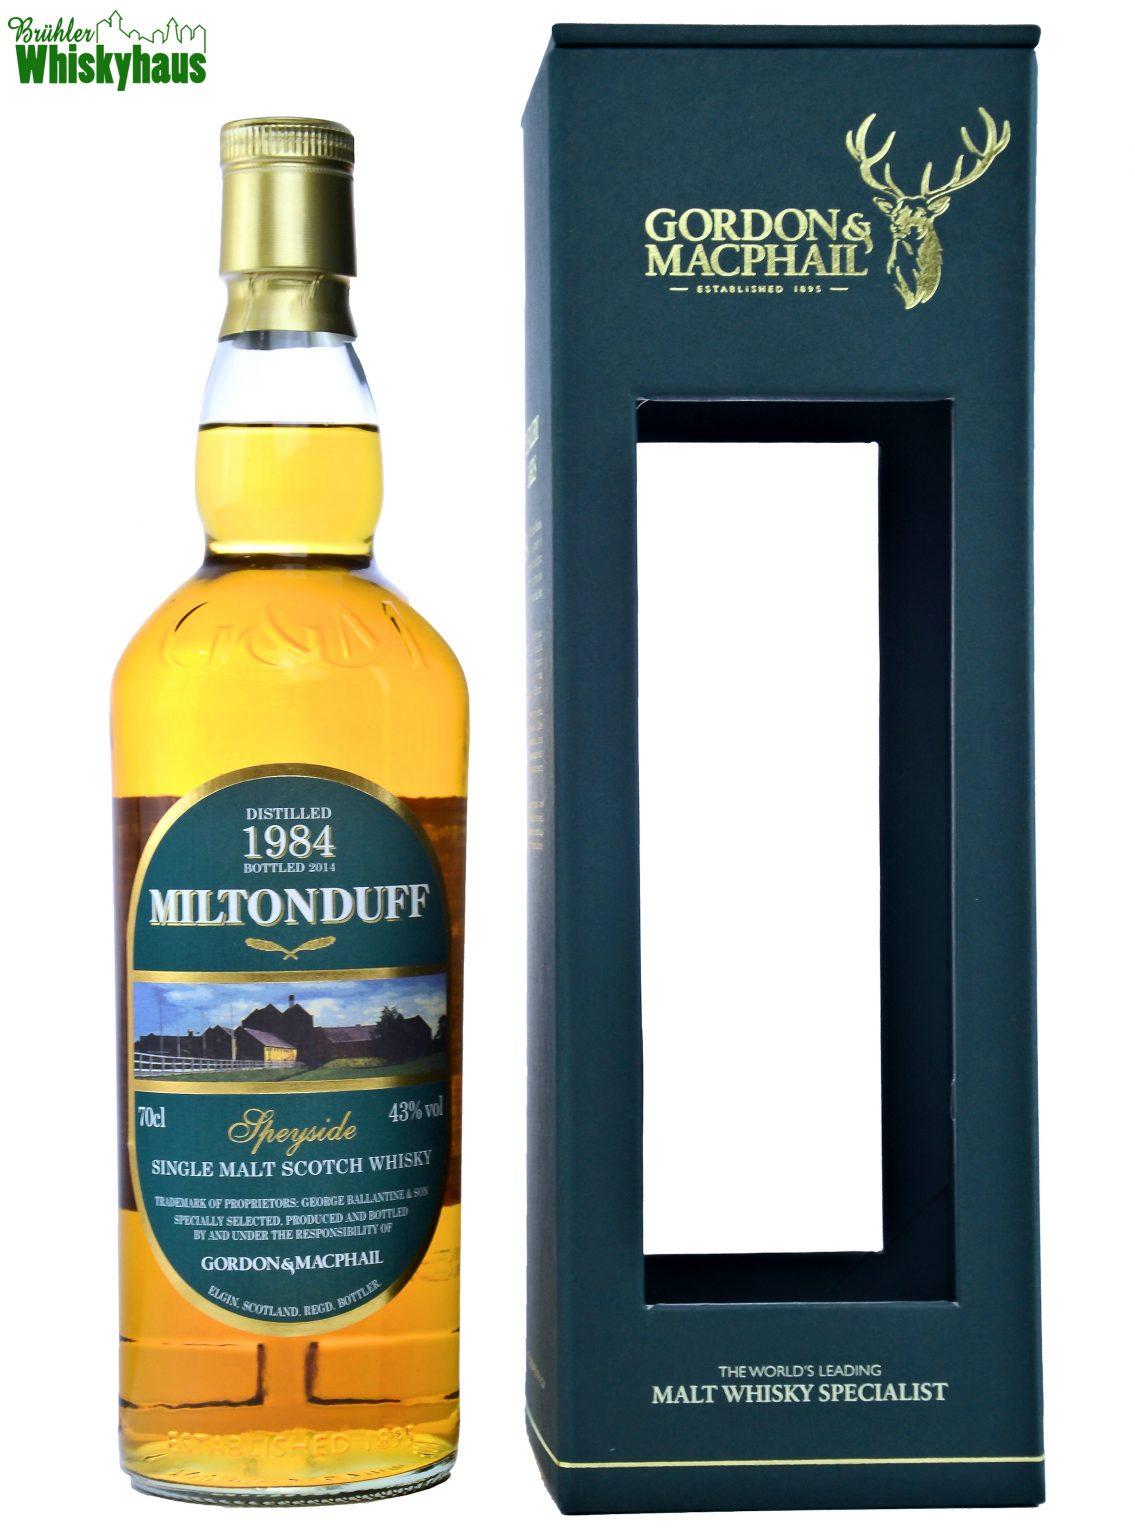 Miltonduff Vintage 1984 - 2014 - Refill Ex-Bourbon Barrels - Gordon & MacPhail - Single Malt Scotch Whisky